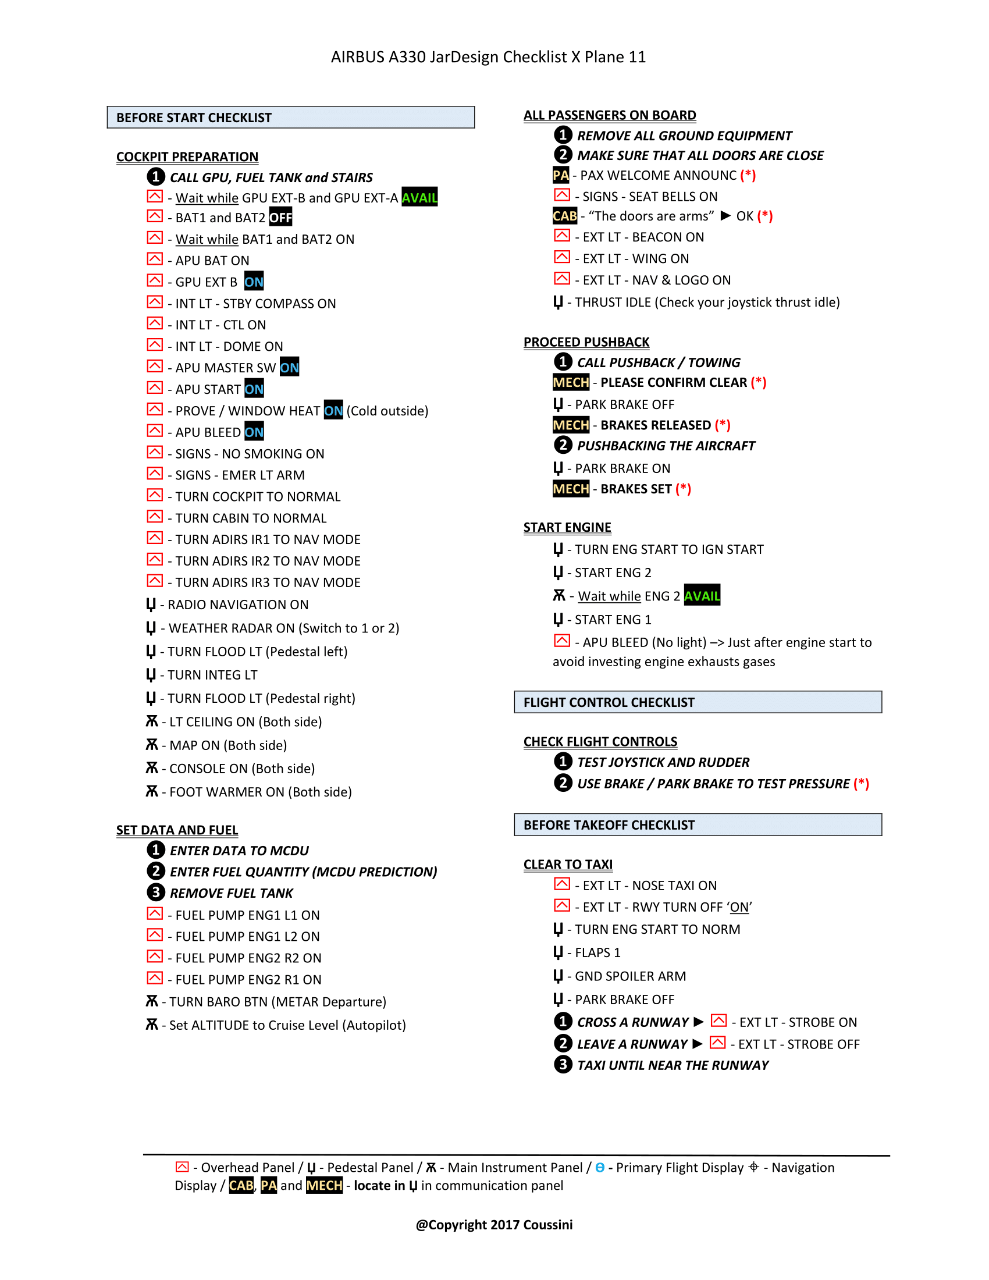 plane checklist